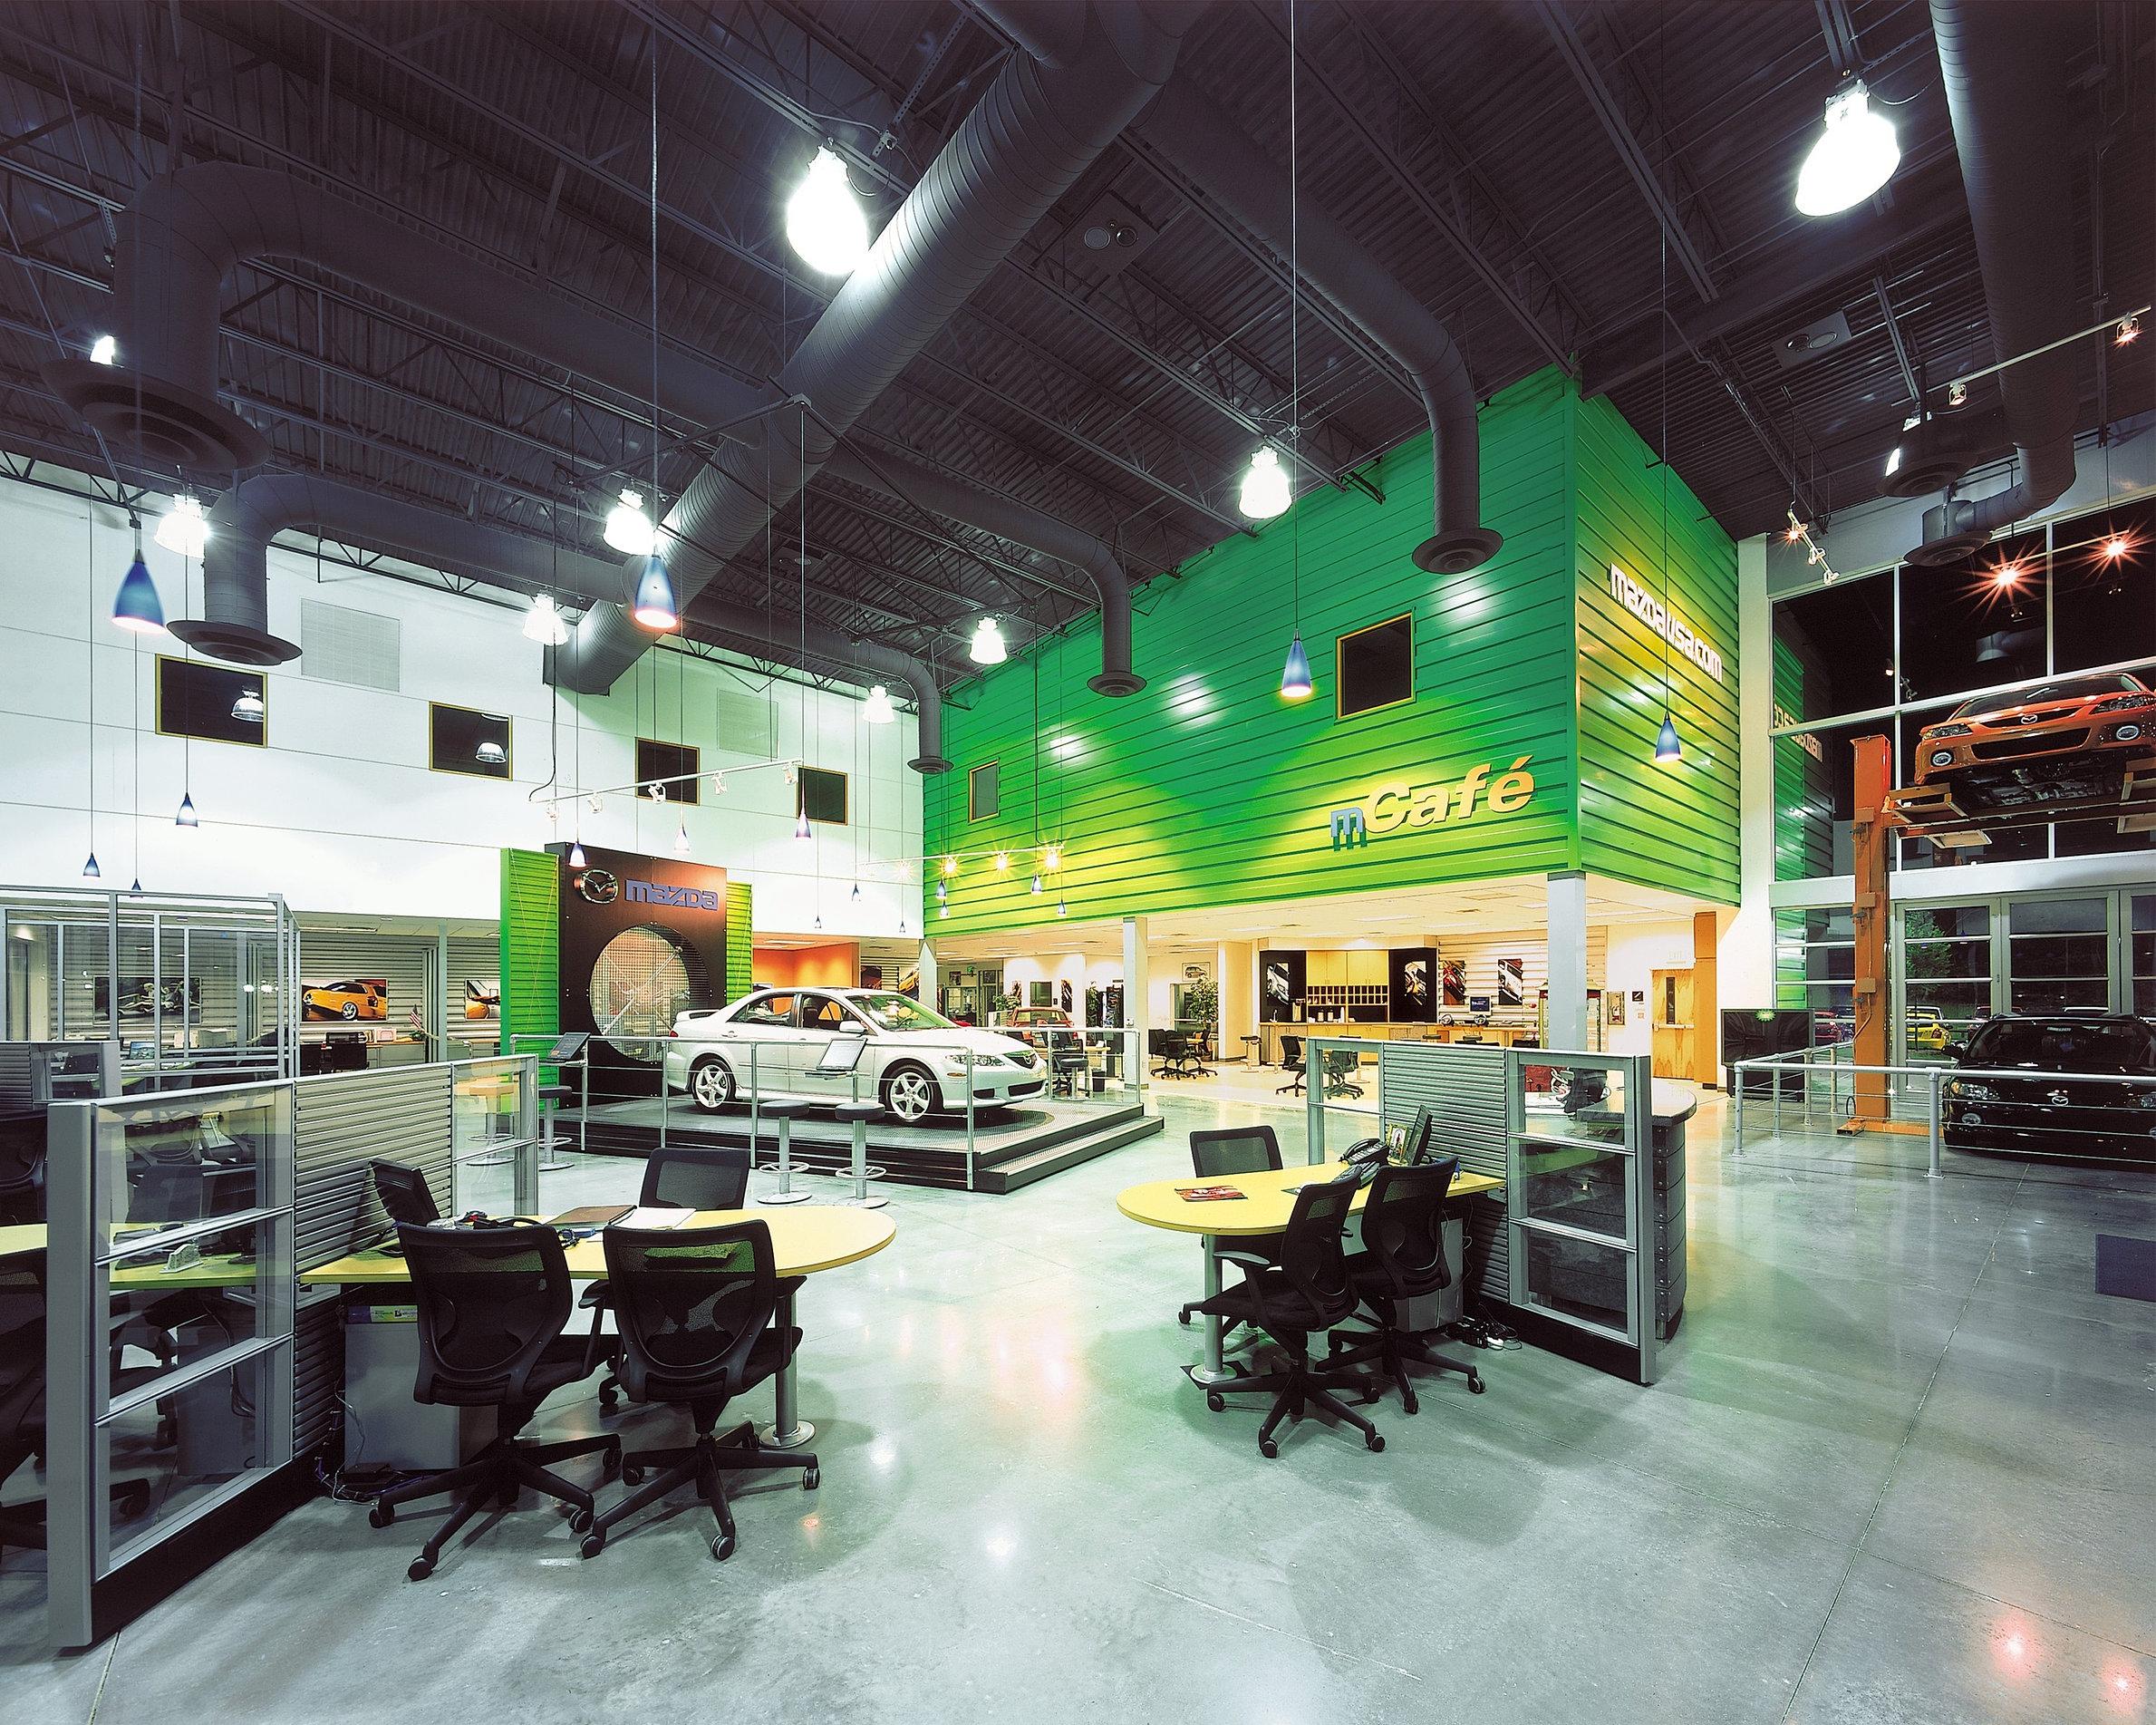 Commercial interior design firms birmingham al for Interior exterior birmingham al